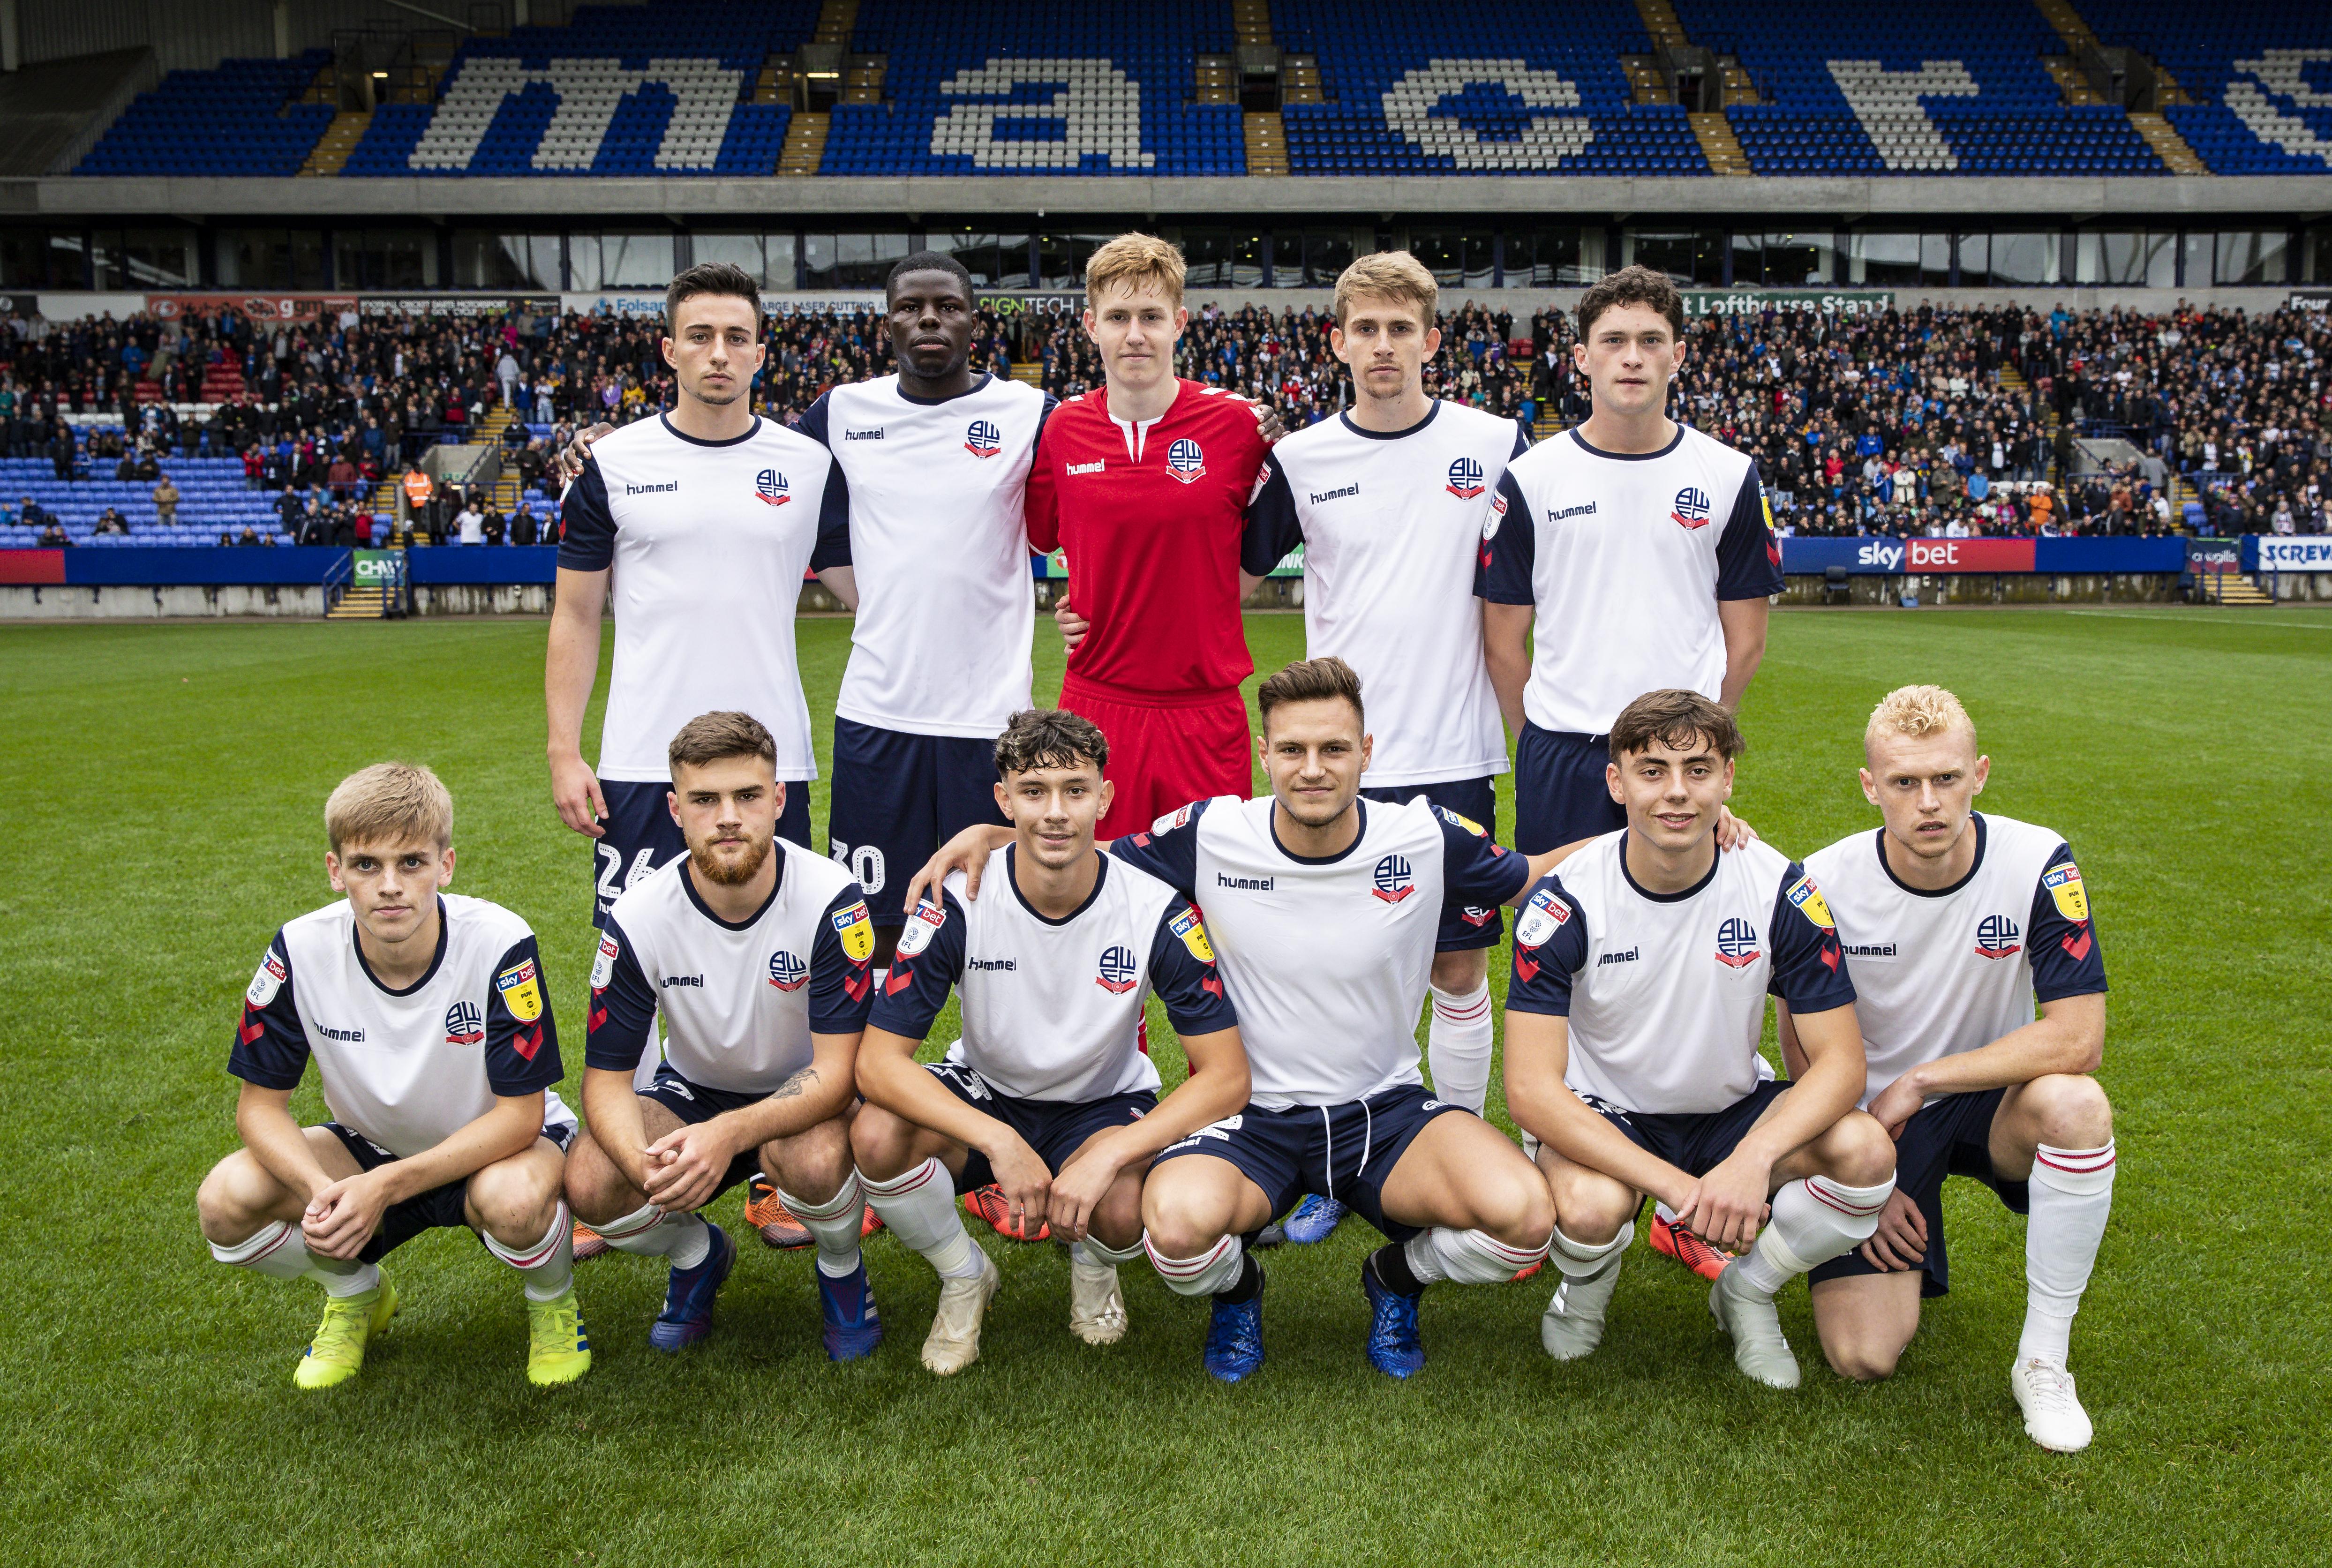 Bolton Wanderers v Coventry City - Sky Bet League One